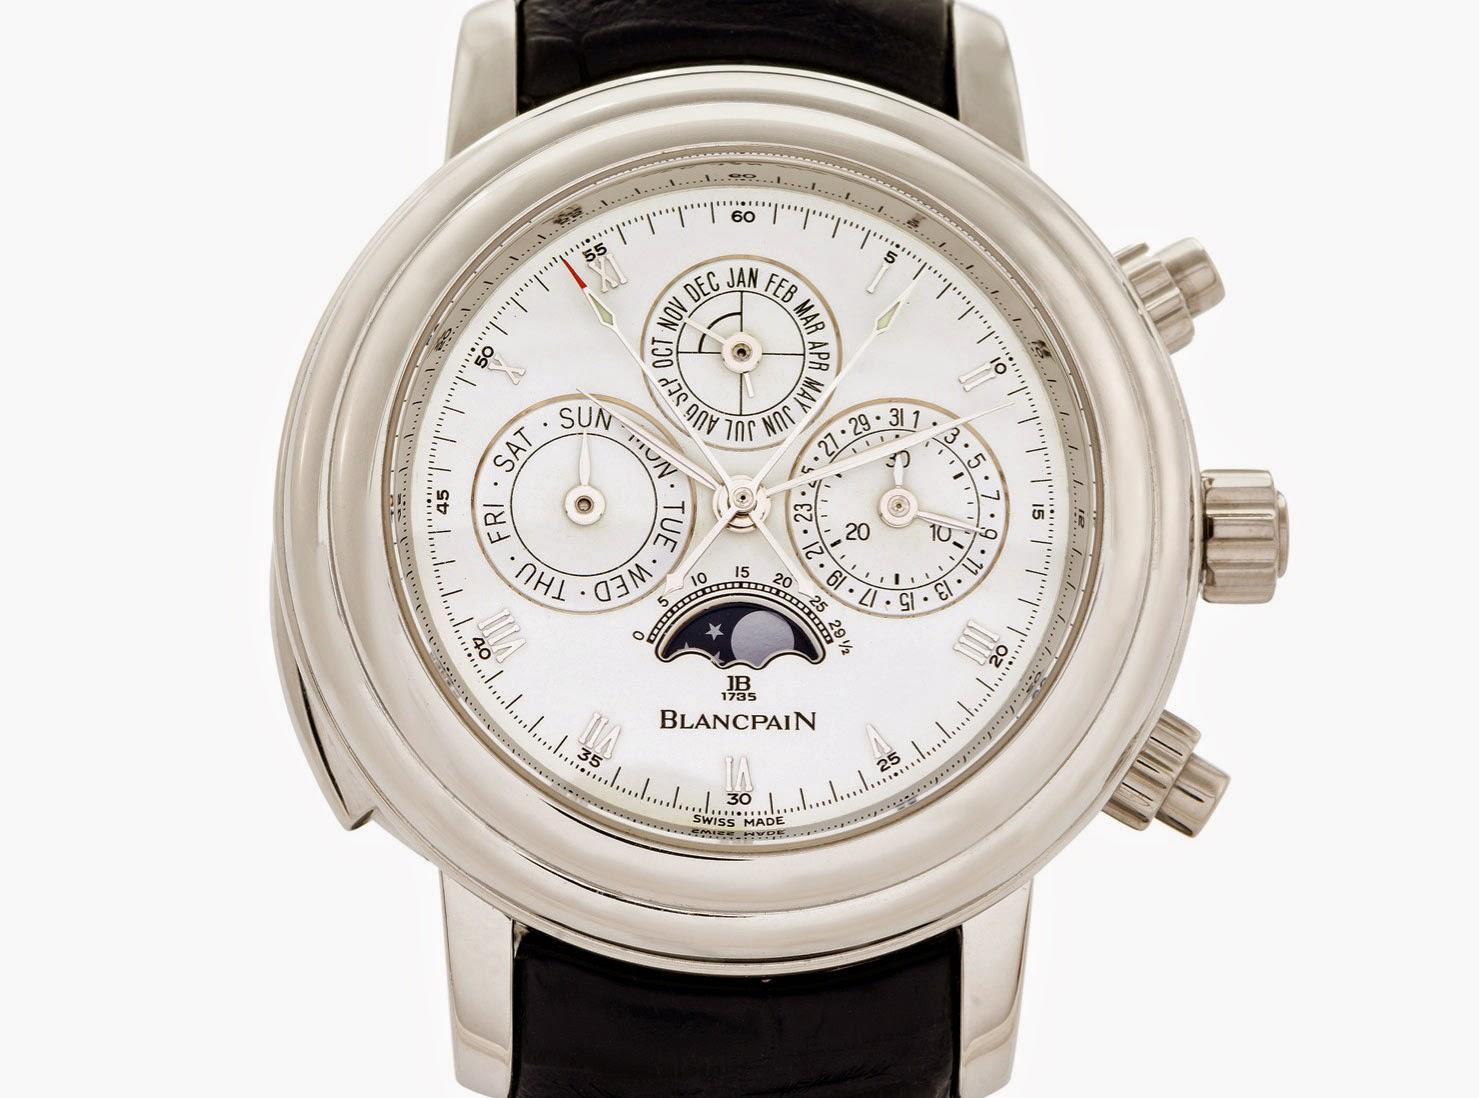 Auctions: rare Blancpain 1735 Grande Complication on sale at Antiquorum